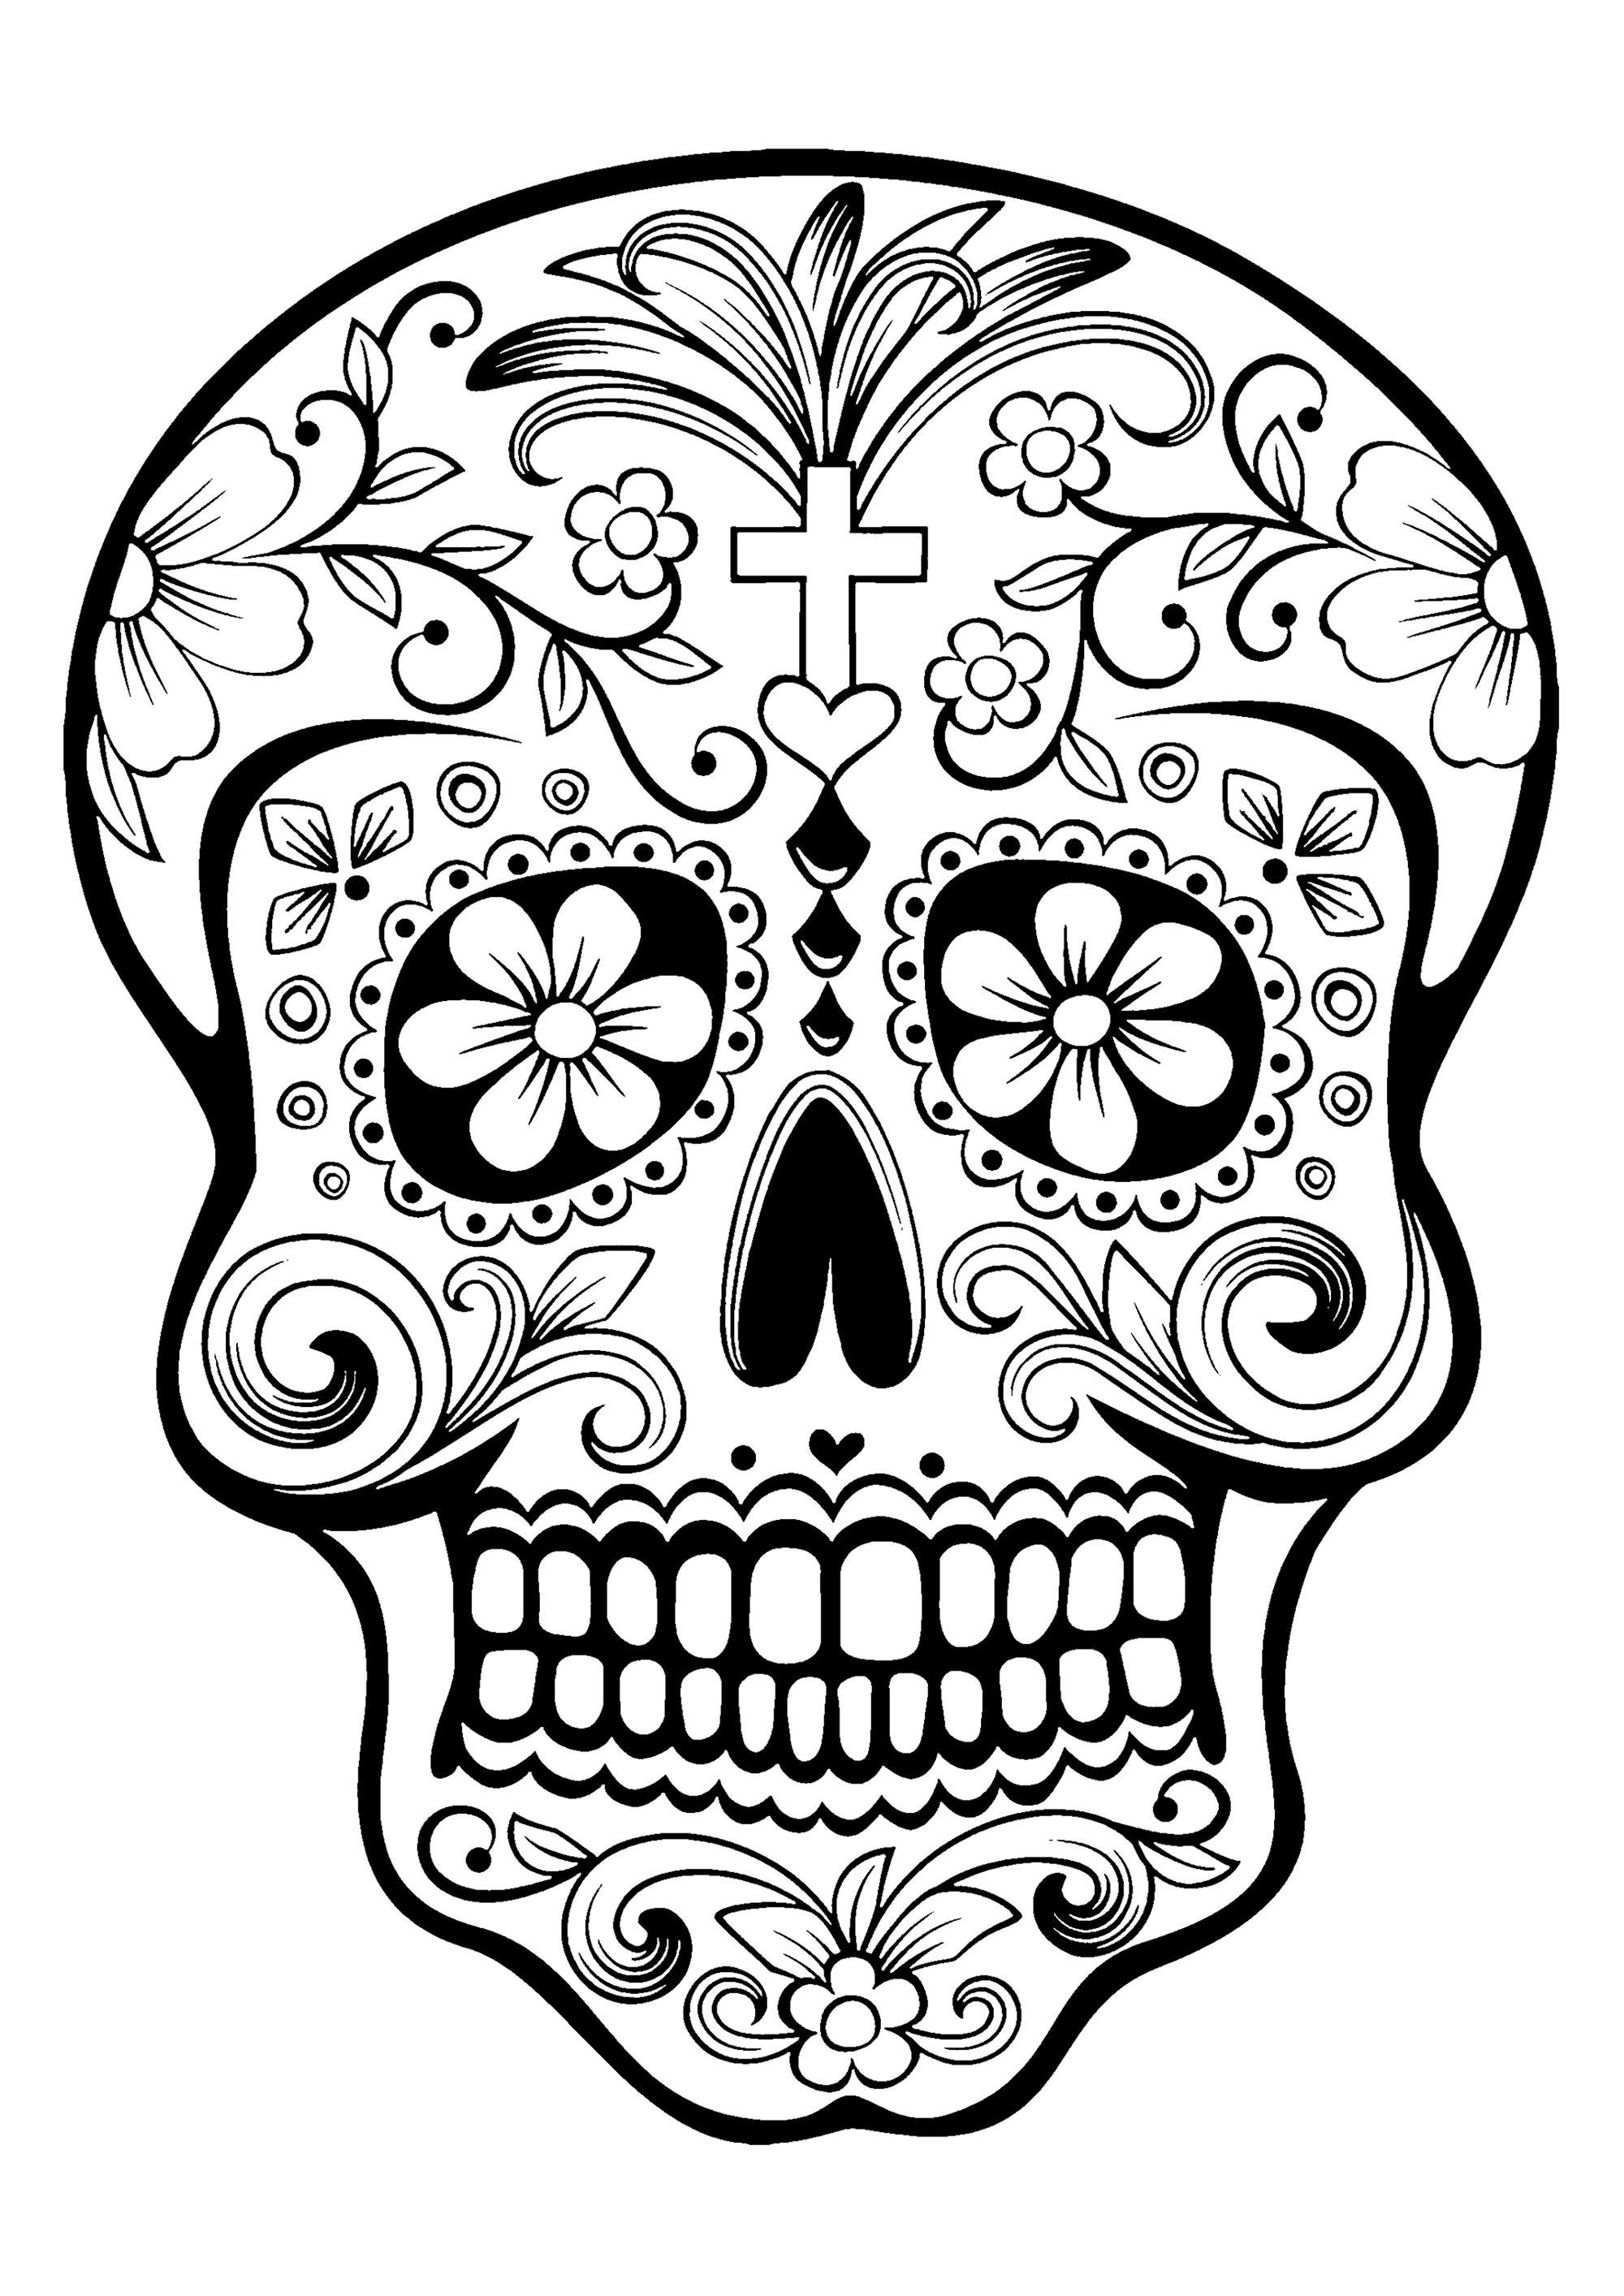 El Dia De Los Muertos 1456 El Dia De Los Muertos